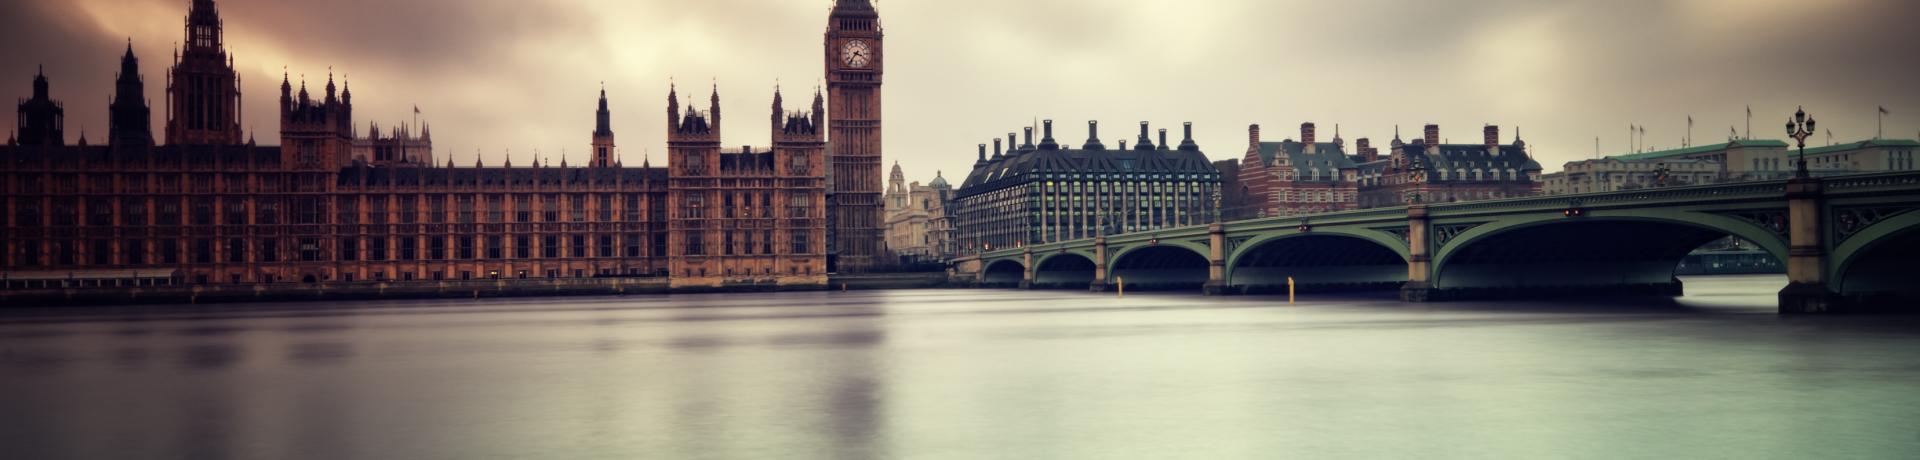 6747+Großbritannien+England+London+TS_111803567.jpg